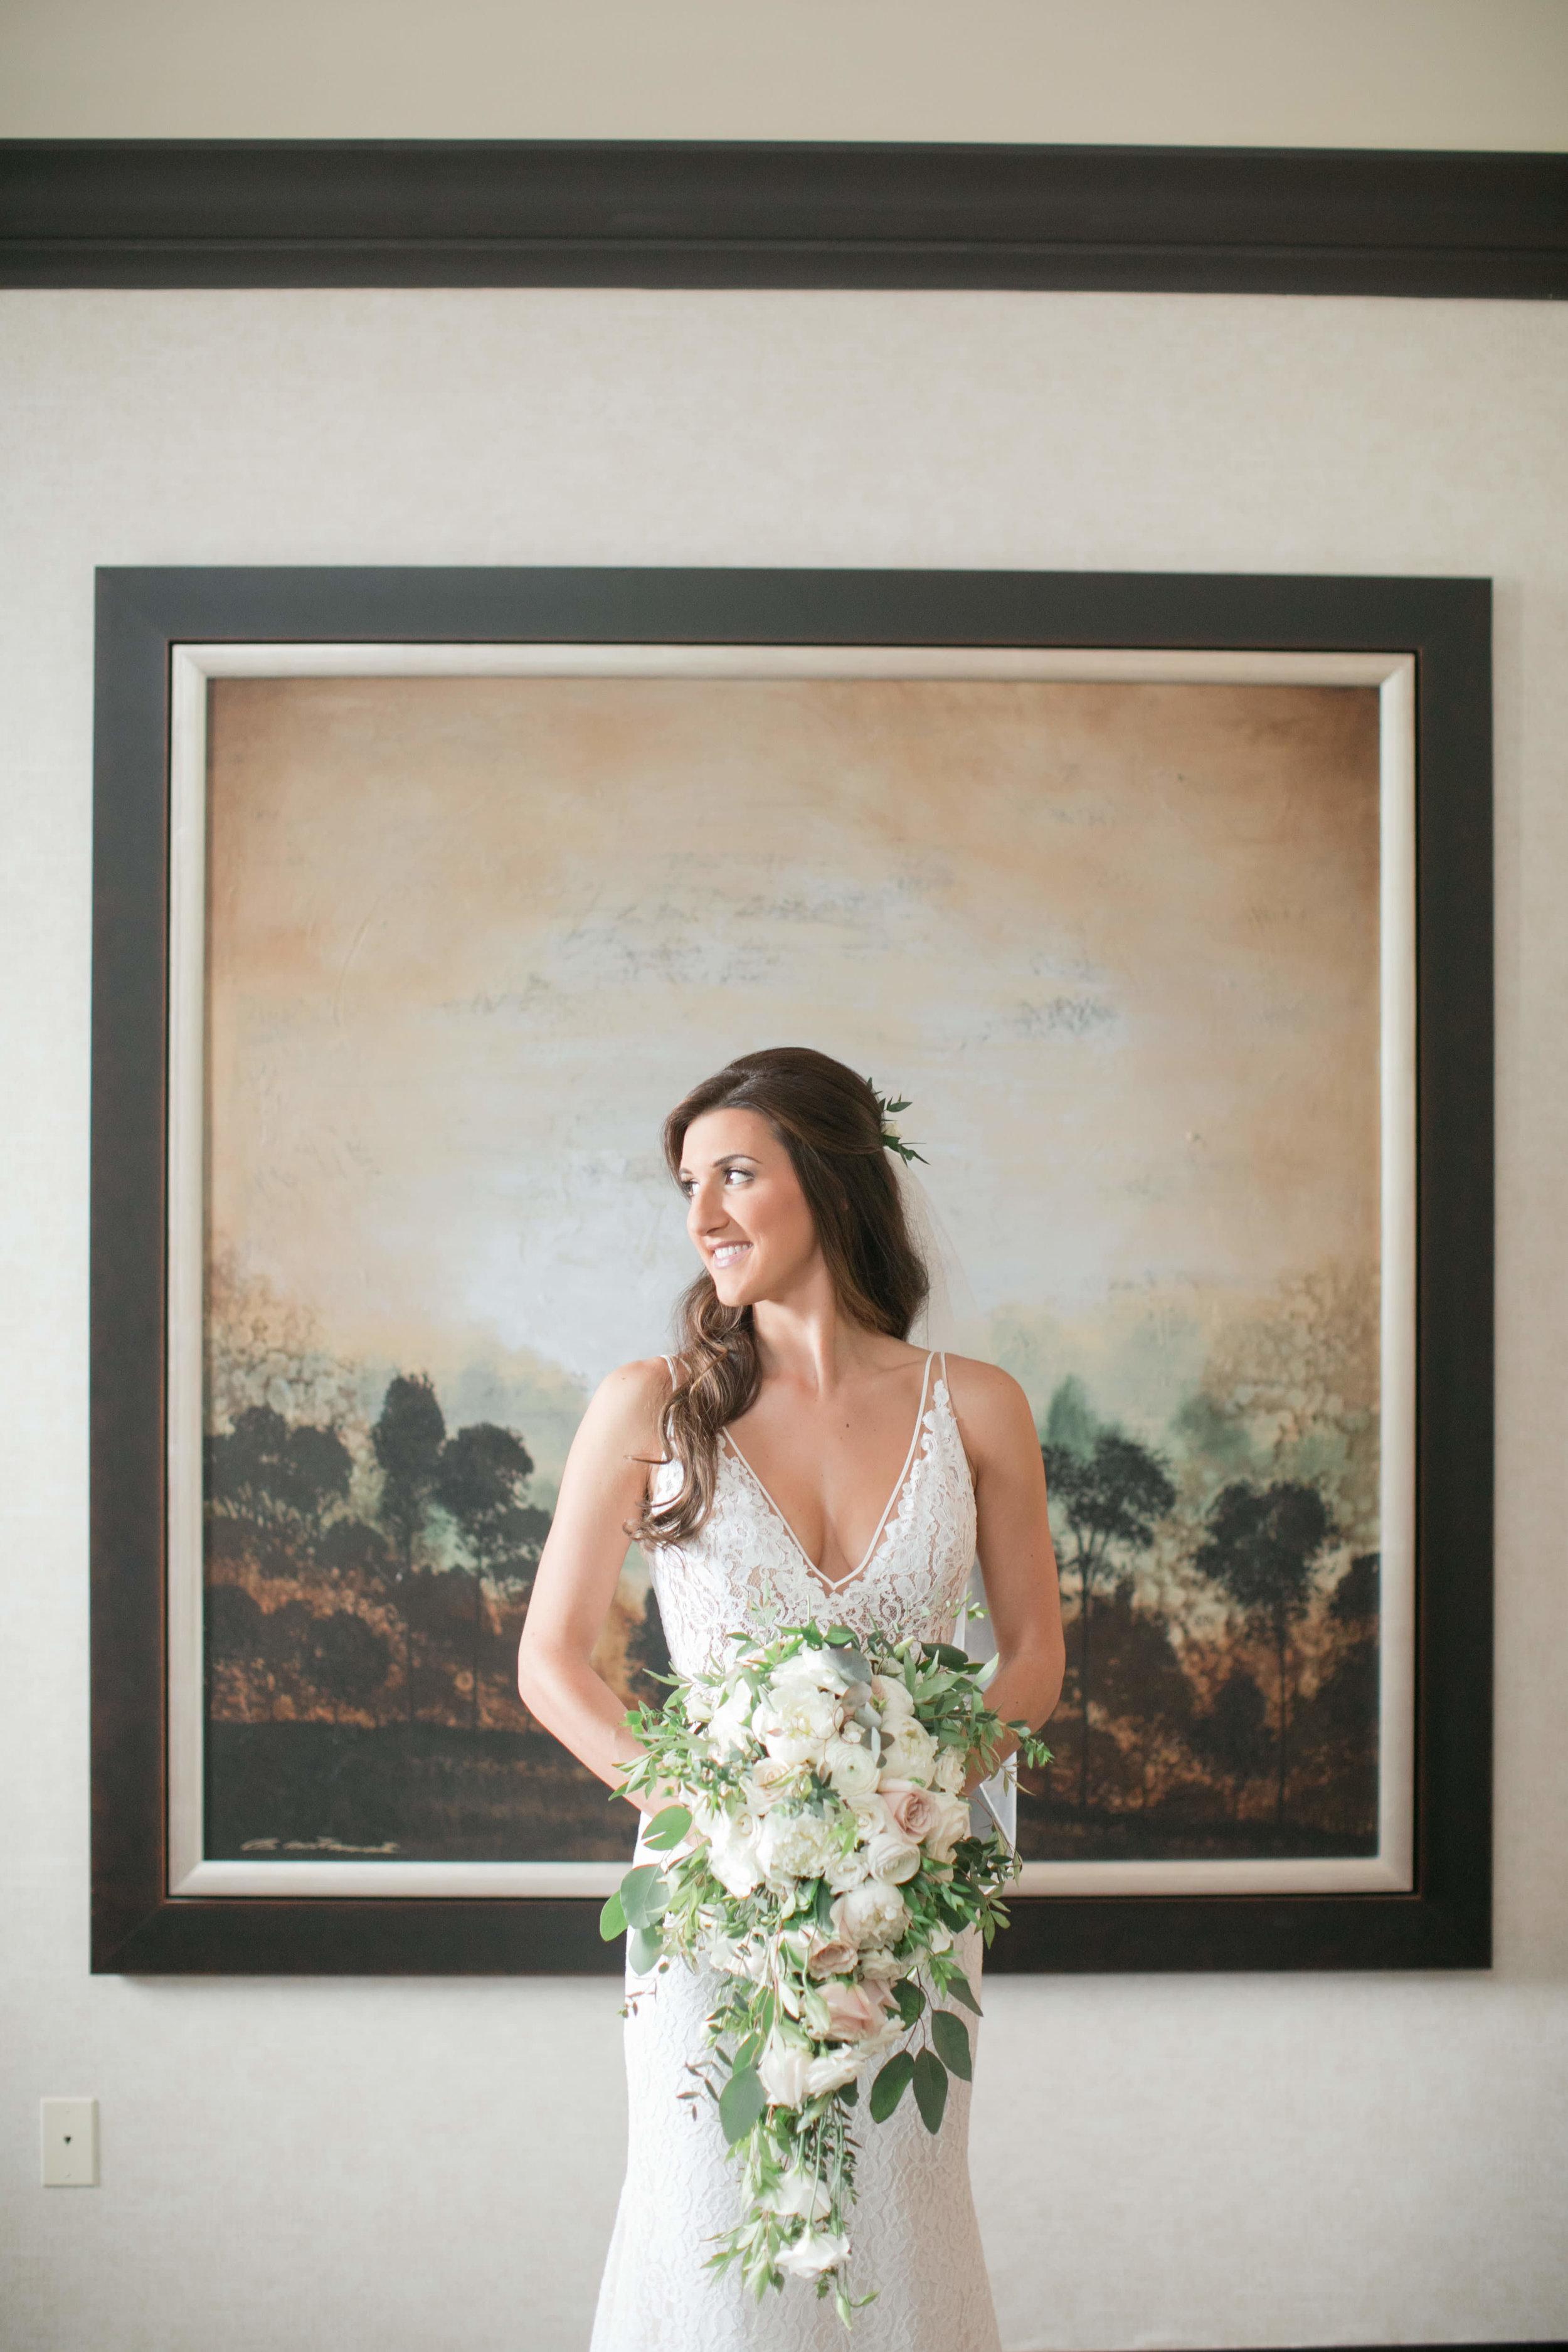 Miranda___Daniel___Daniel_Ricci_Weddings___High_Res._Finals_278.jpg